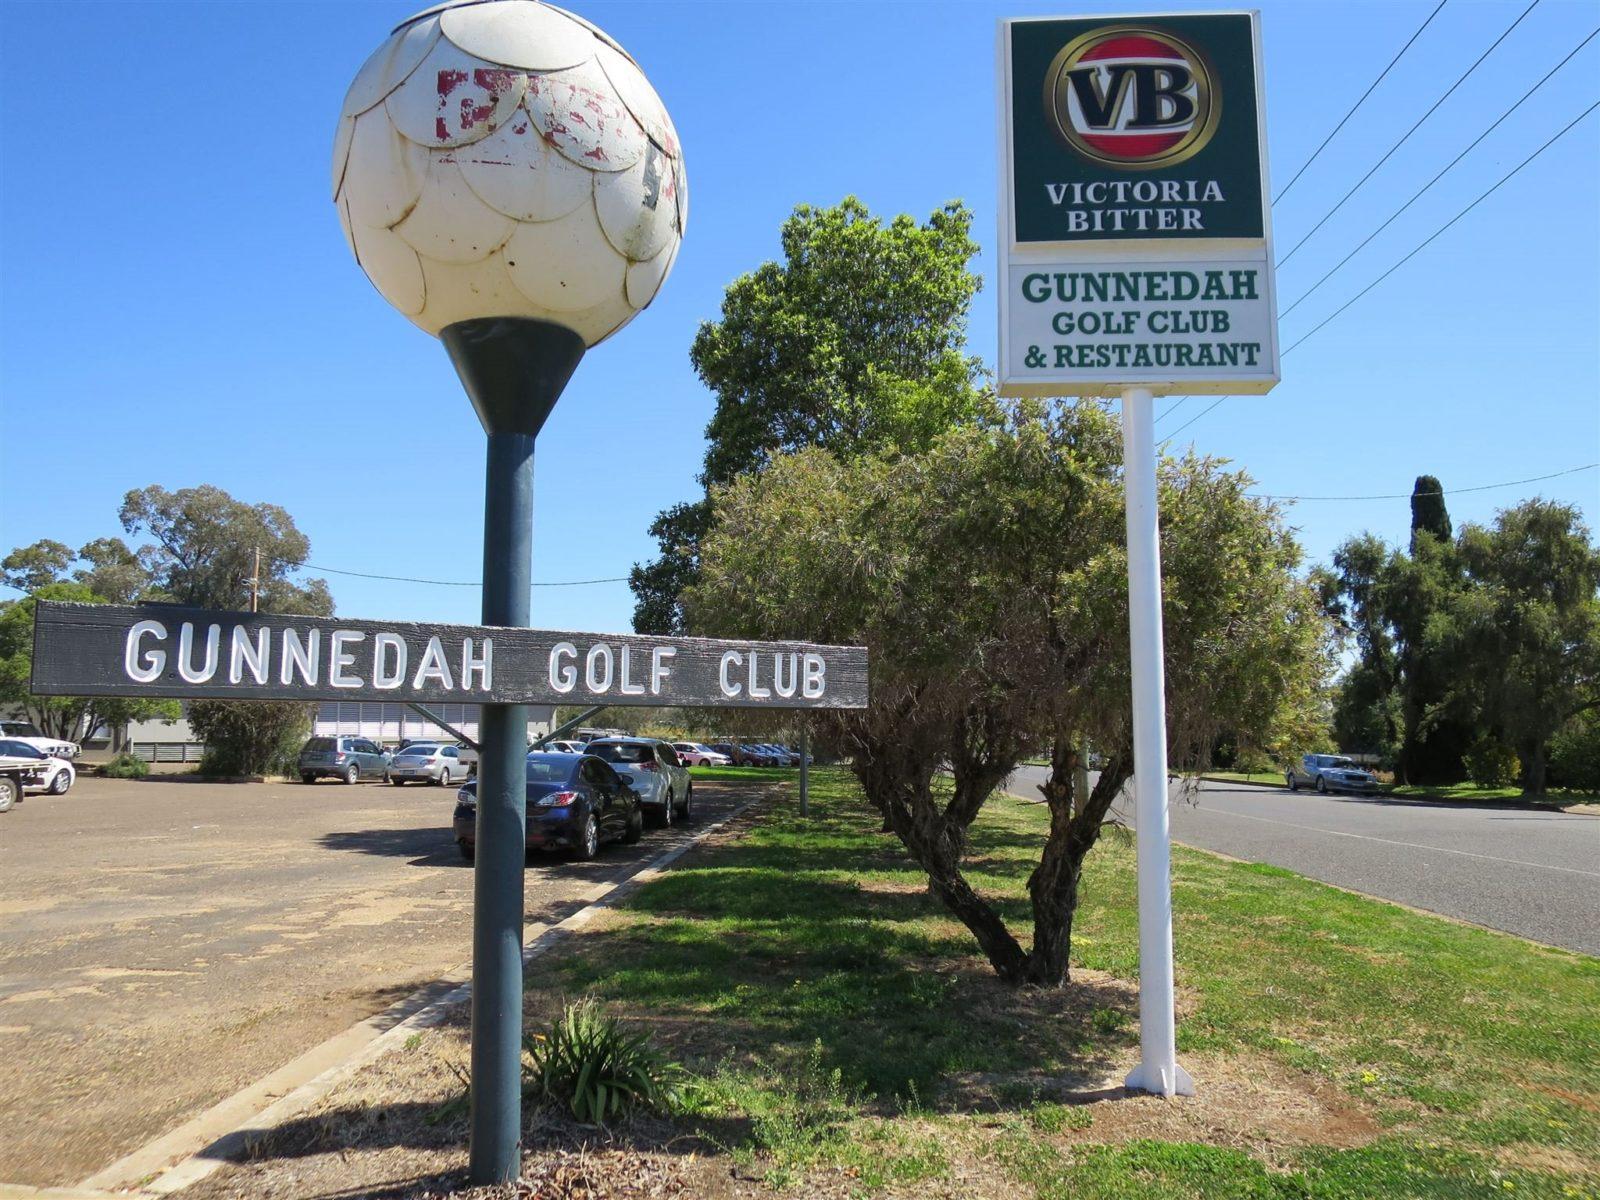 Gunnedah Golf Club